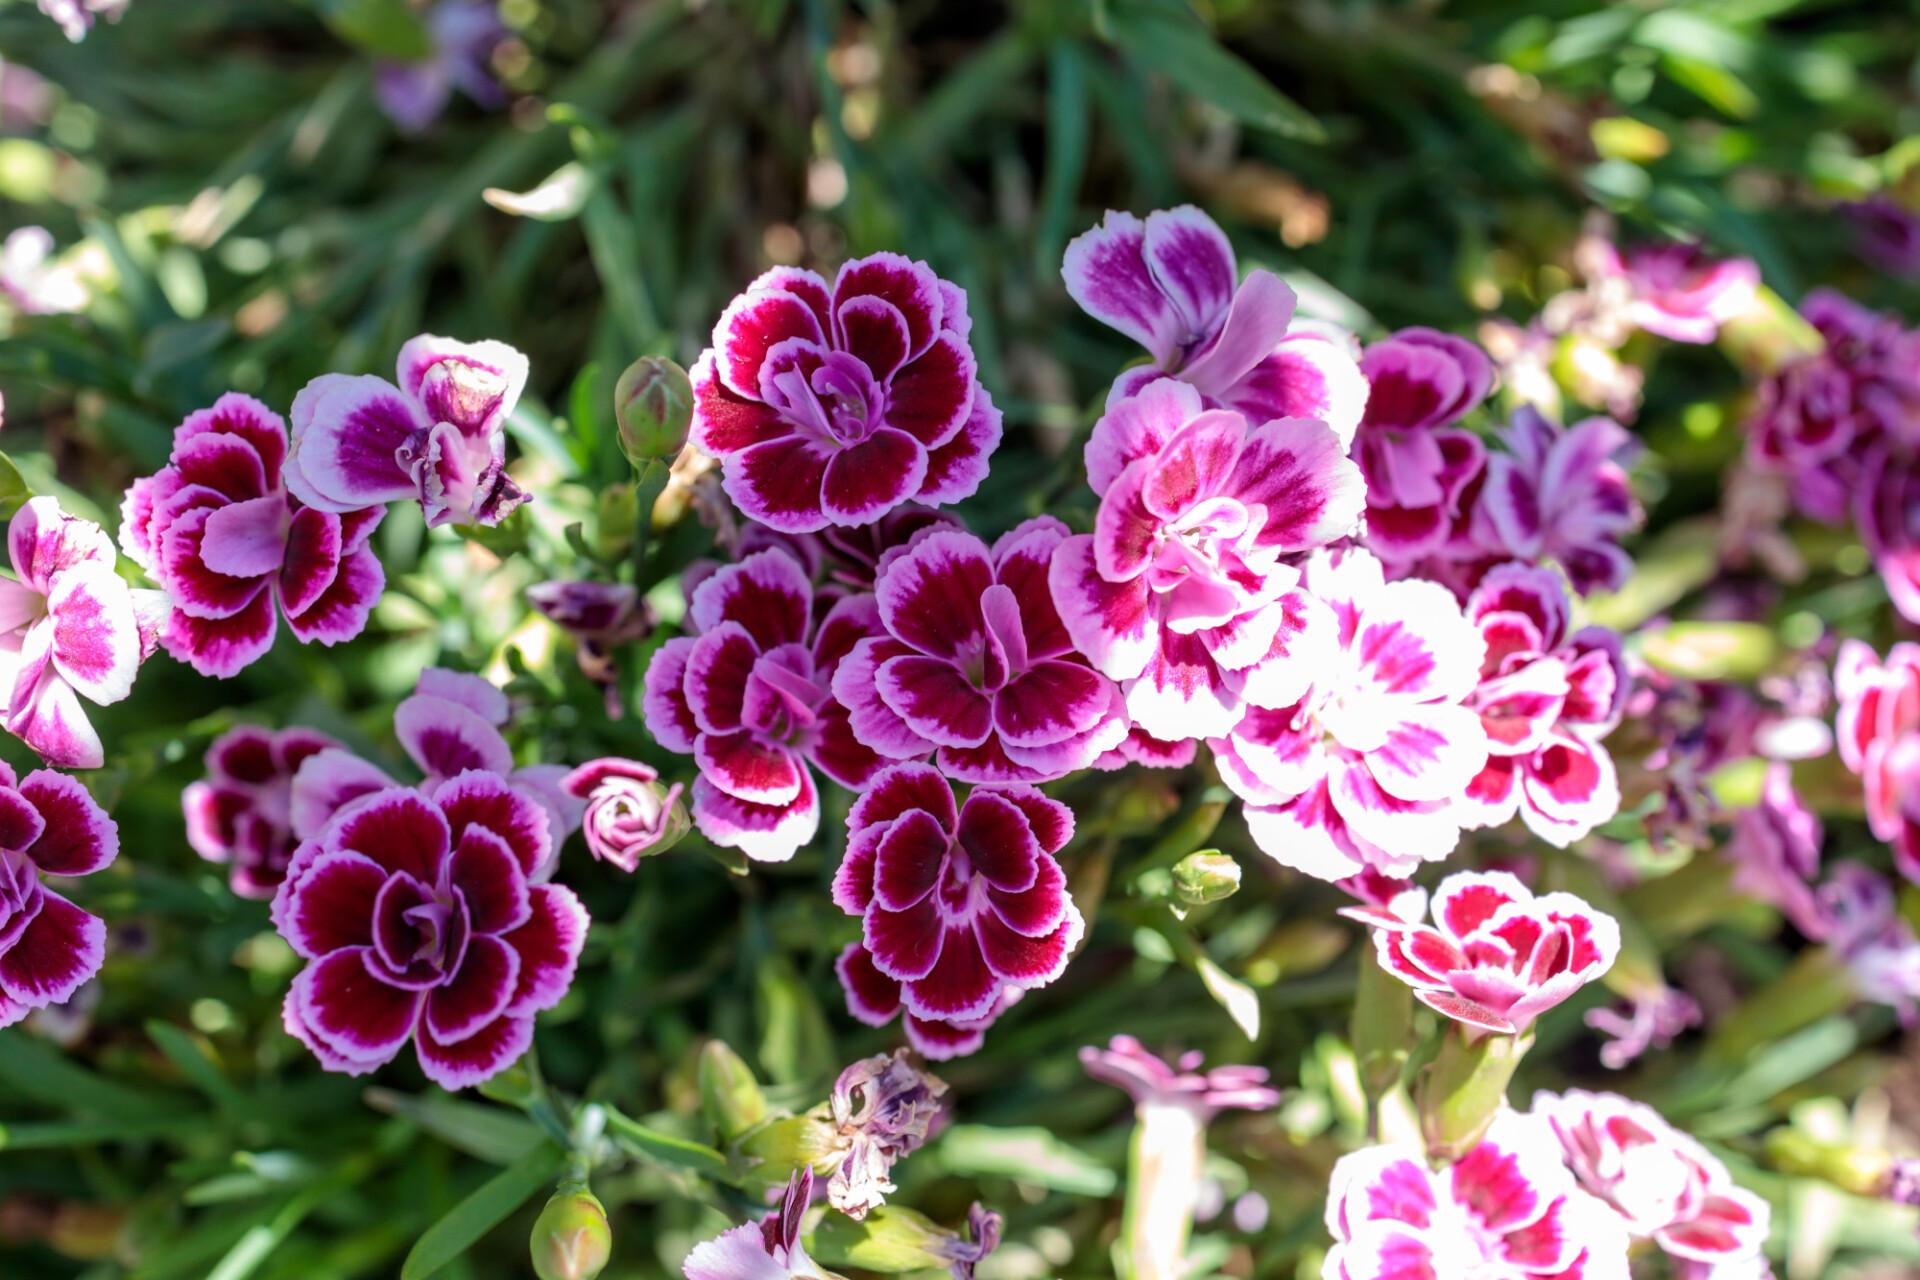 Pelargonium grandiflorum pink flower